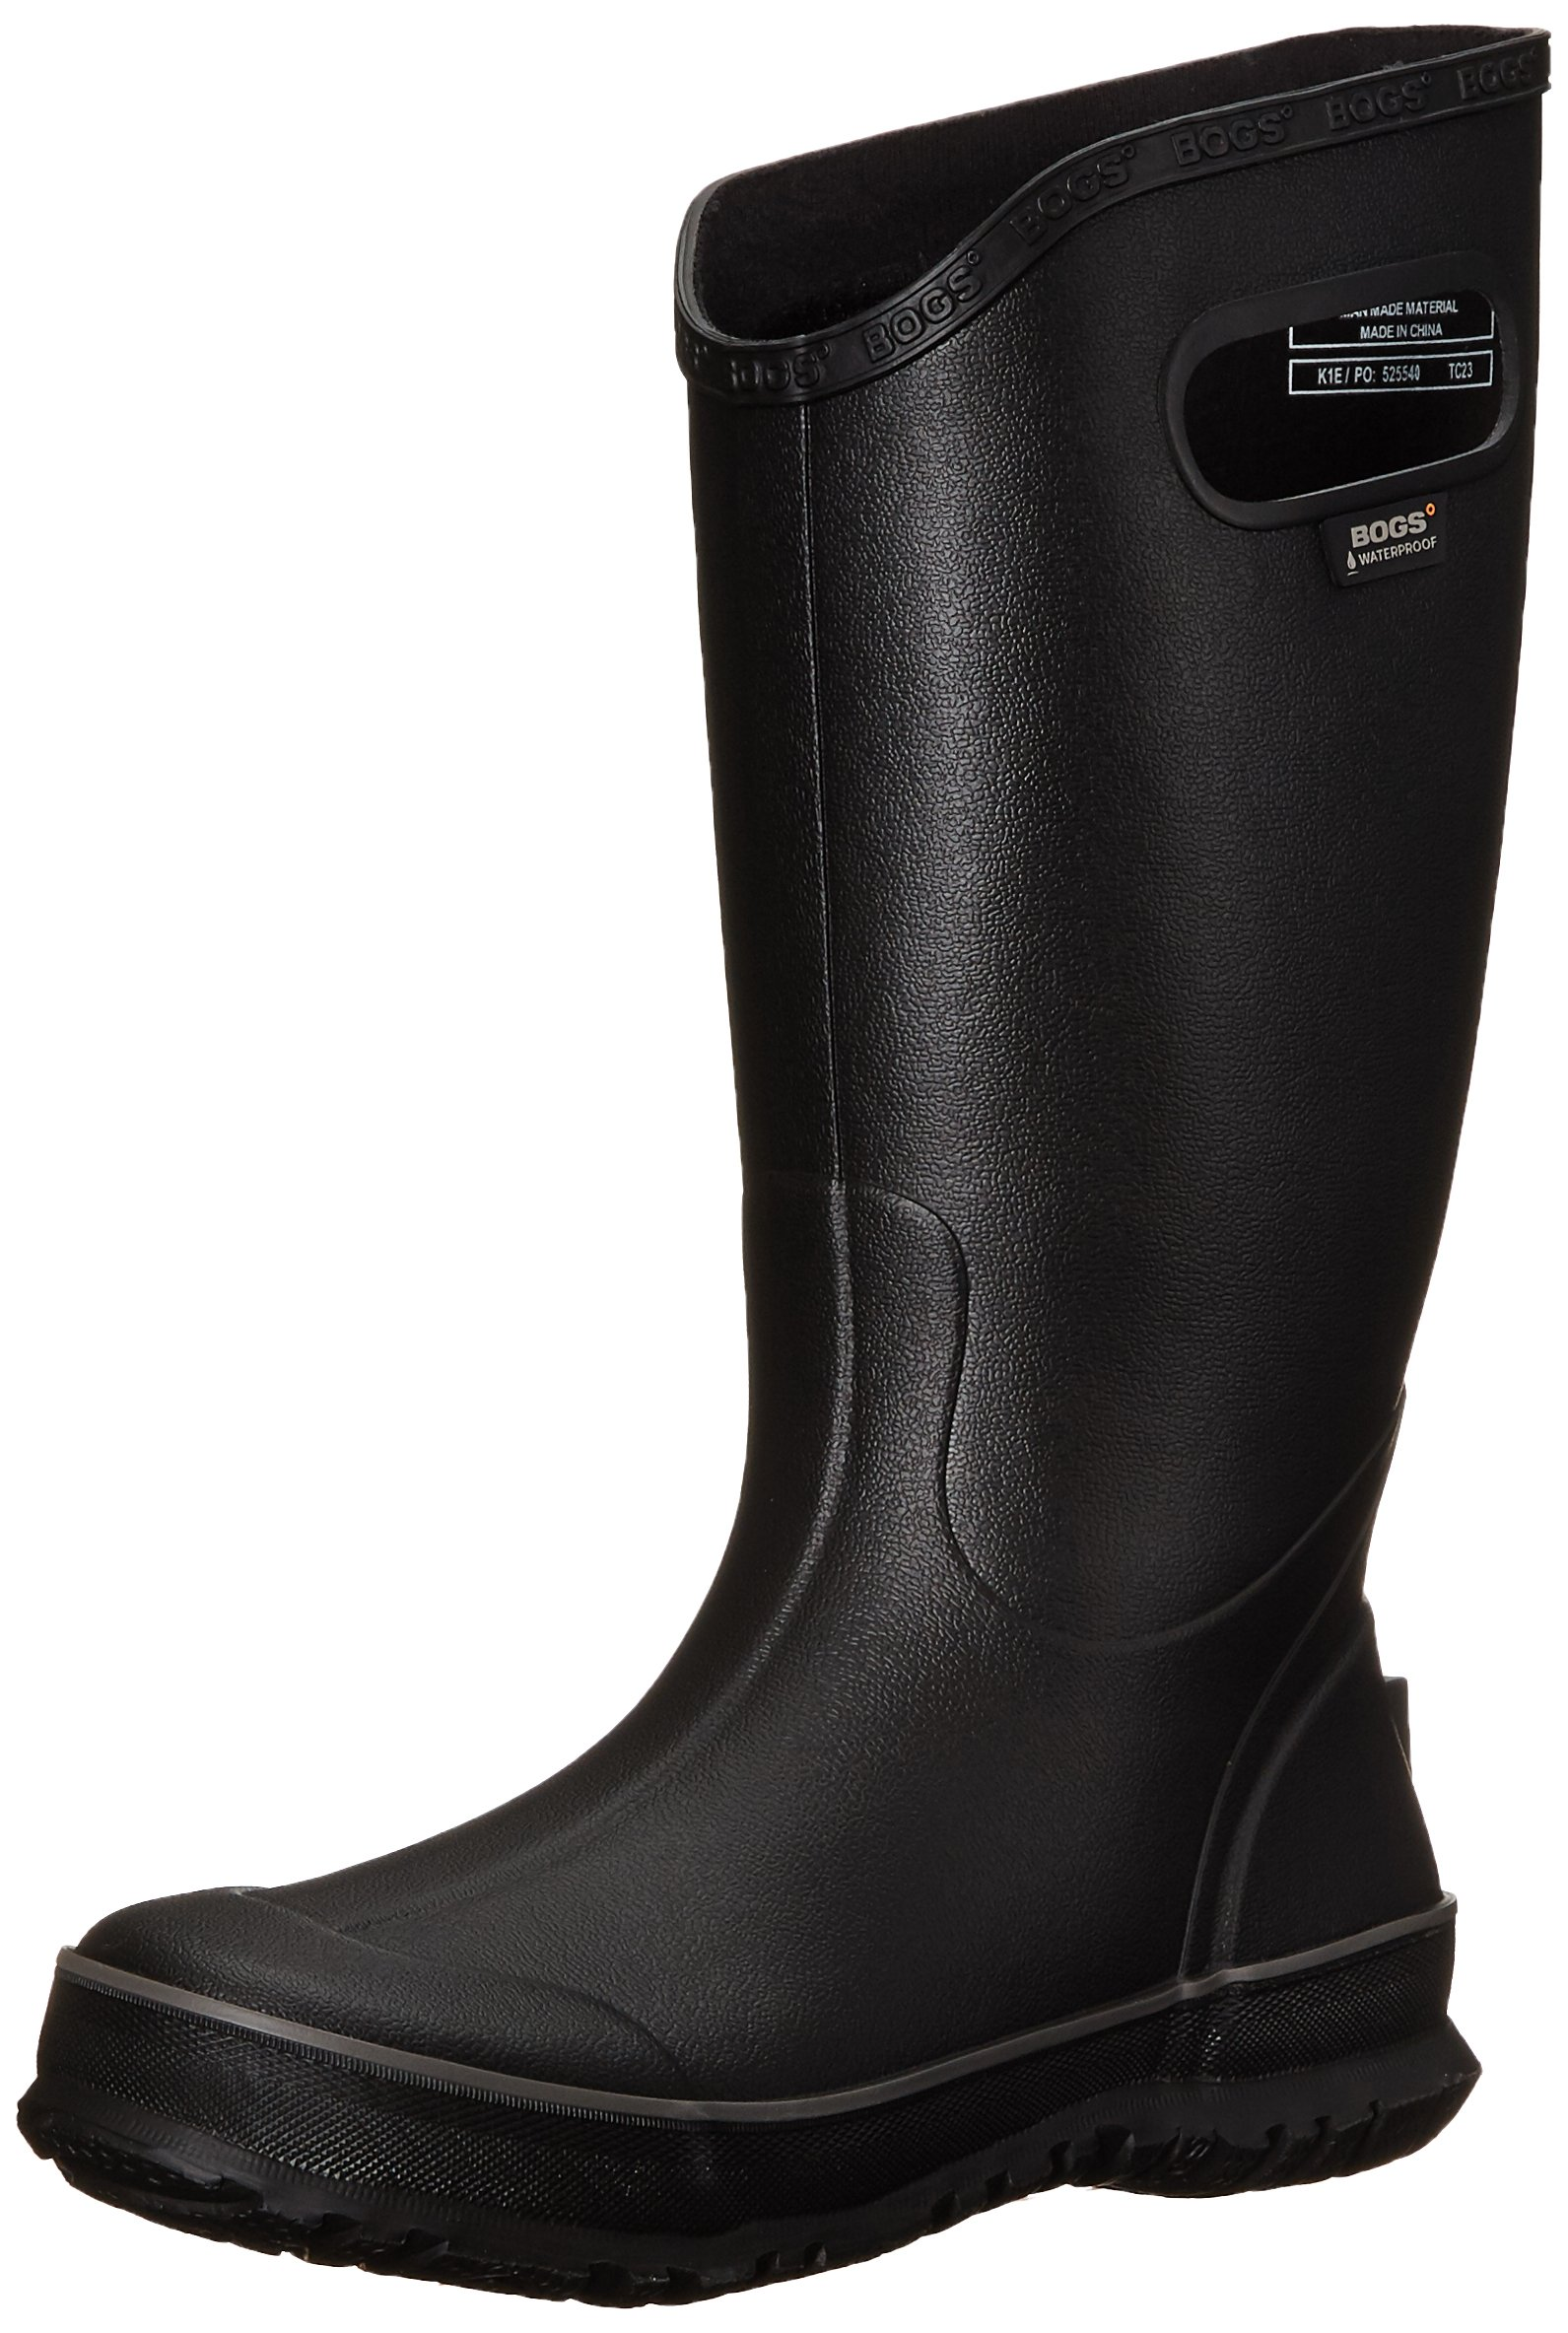 Bogs Men's Waterproof Rubber Rain Boot, Black, 9 D(M) US